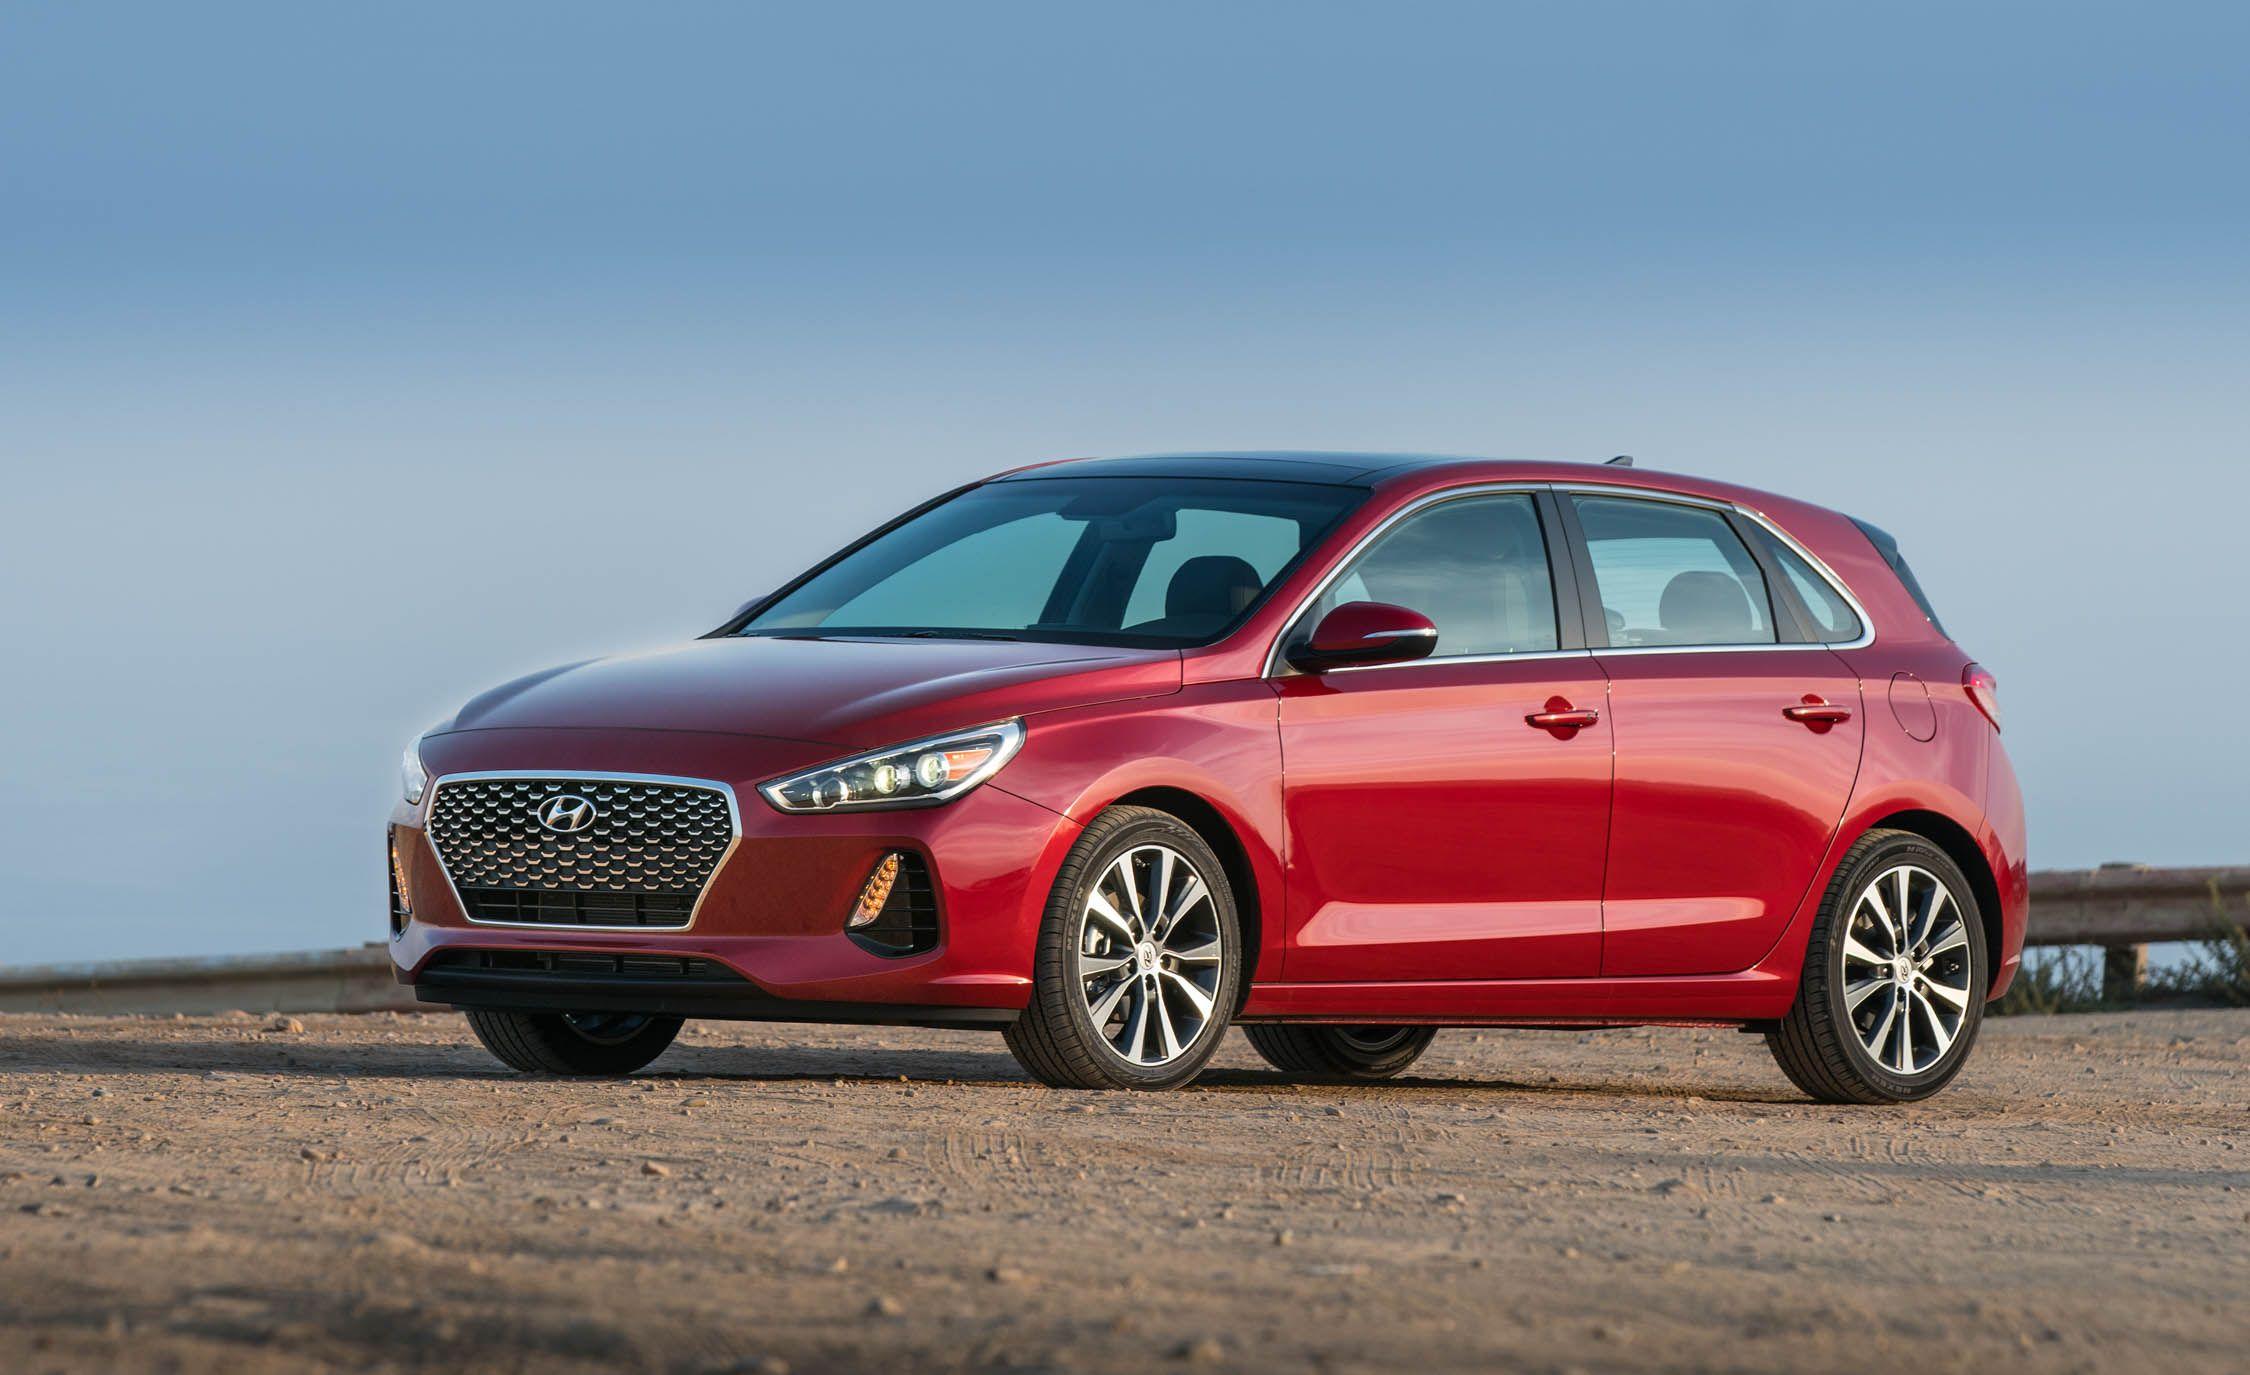 Hyundai Elantra GT Reviews | Hyundai Elantra GT Price, Photos, and ...